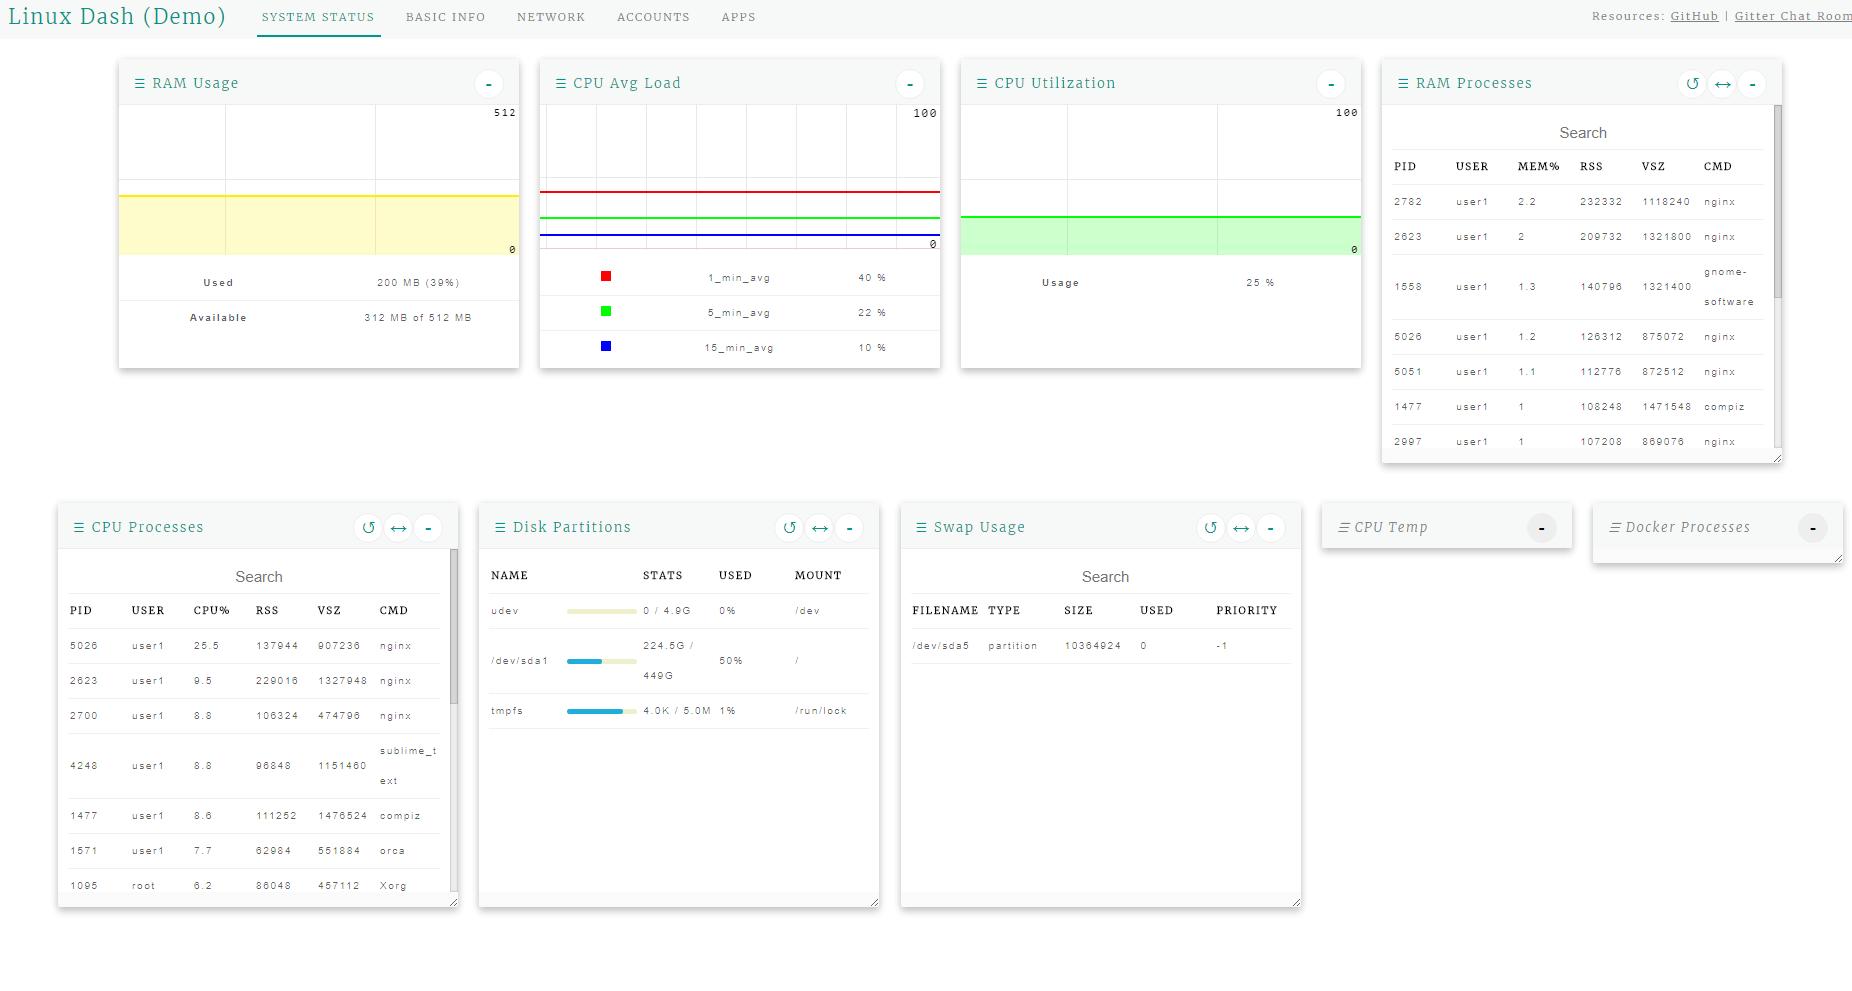 Веб-интерфейс статистики сервера linux-dash